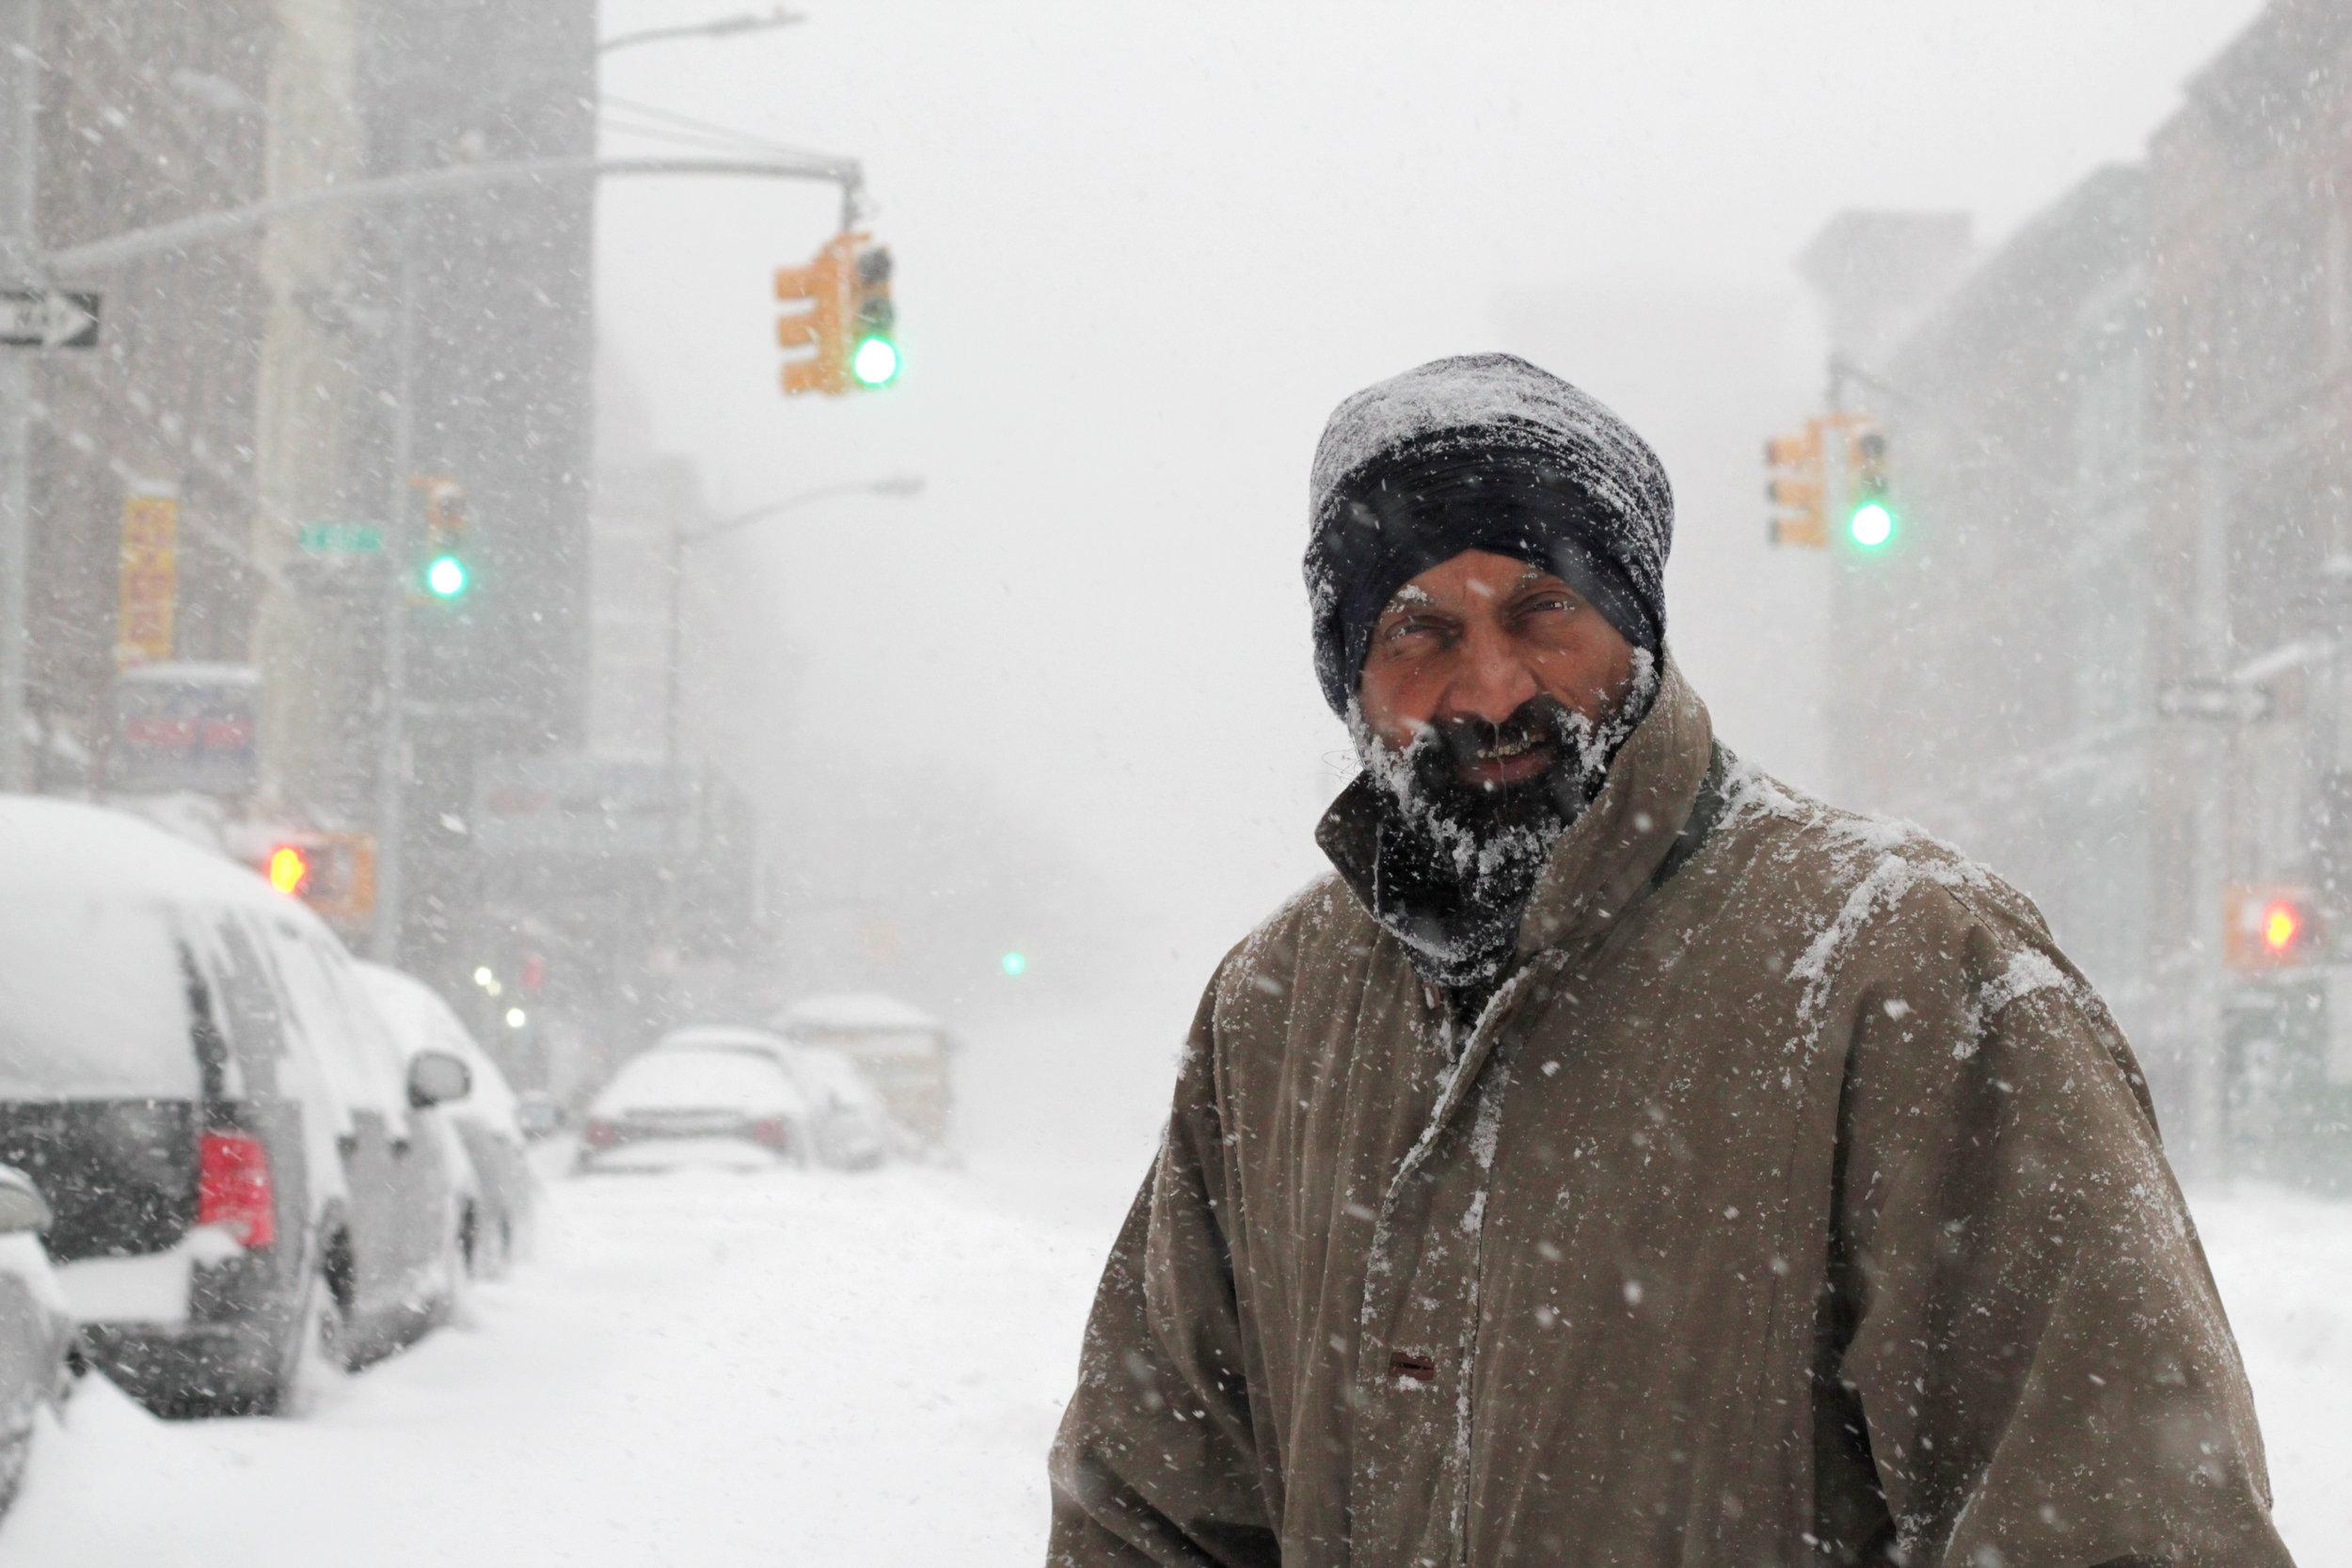 """Looks like I'm in The Revenant."" East Harlem, NY. January 23, 2016"